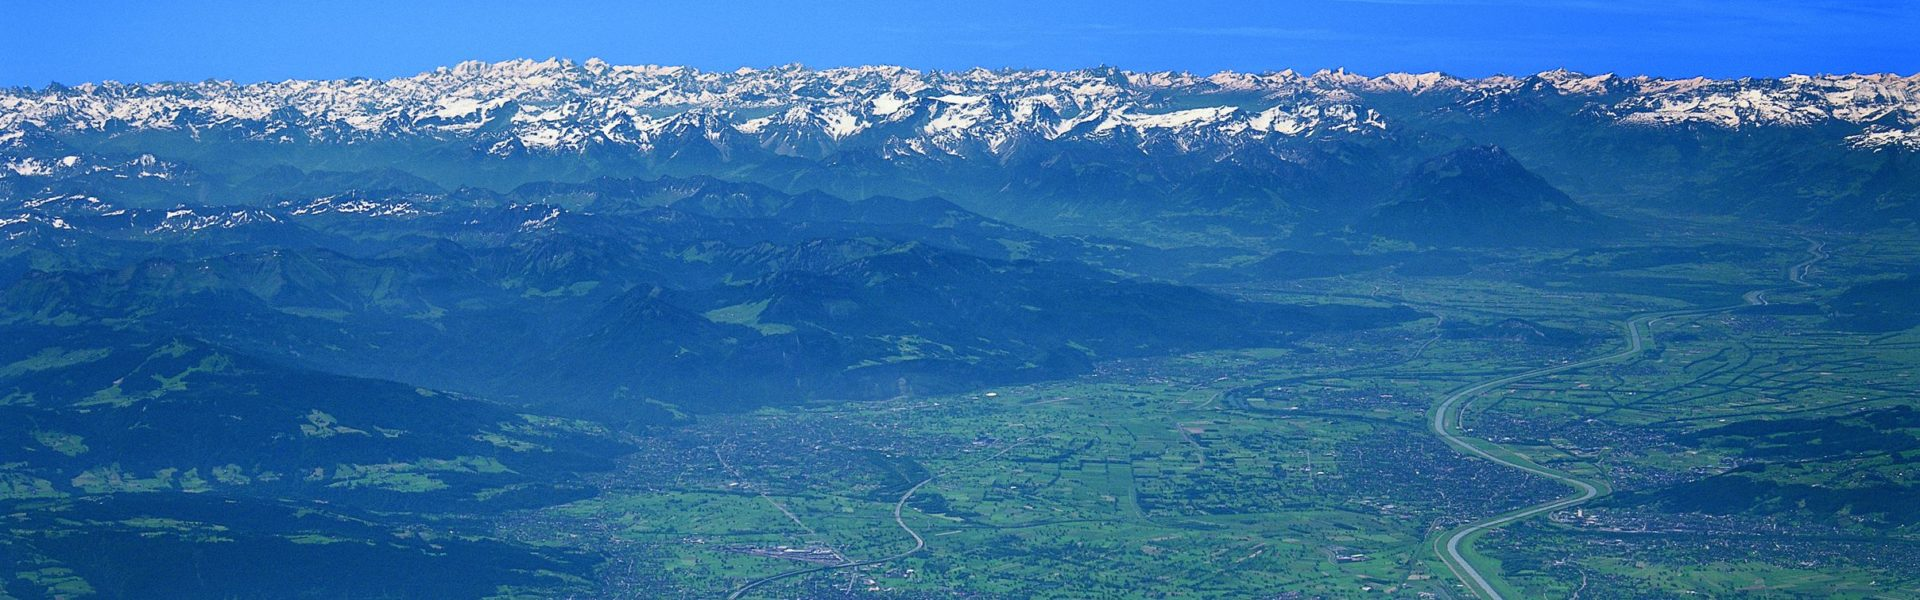 Vorarlberg-Panorama